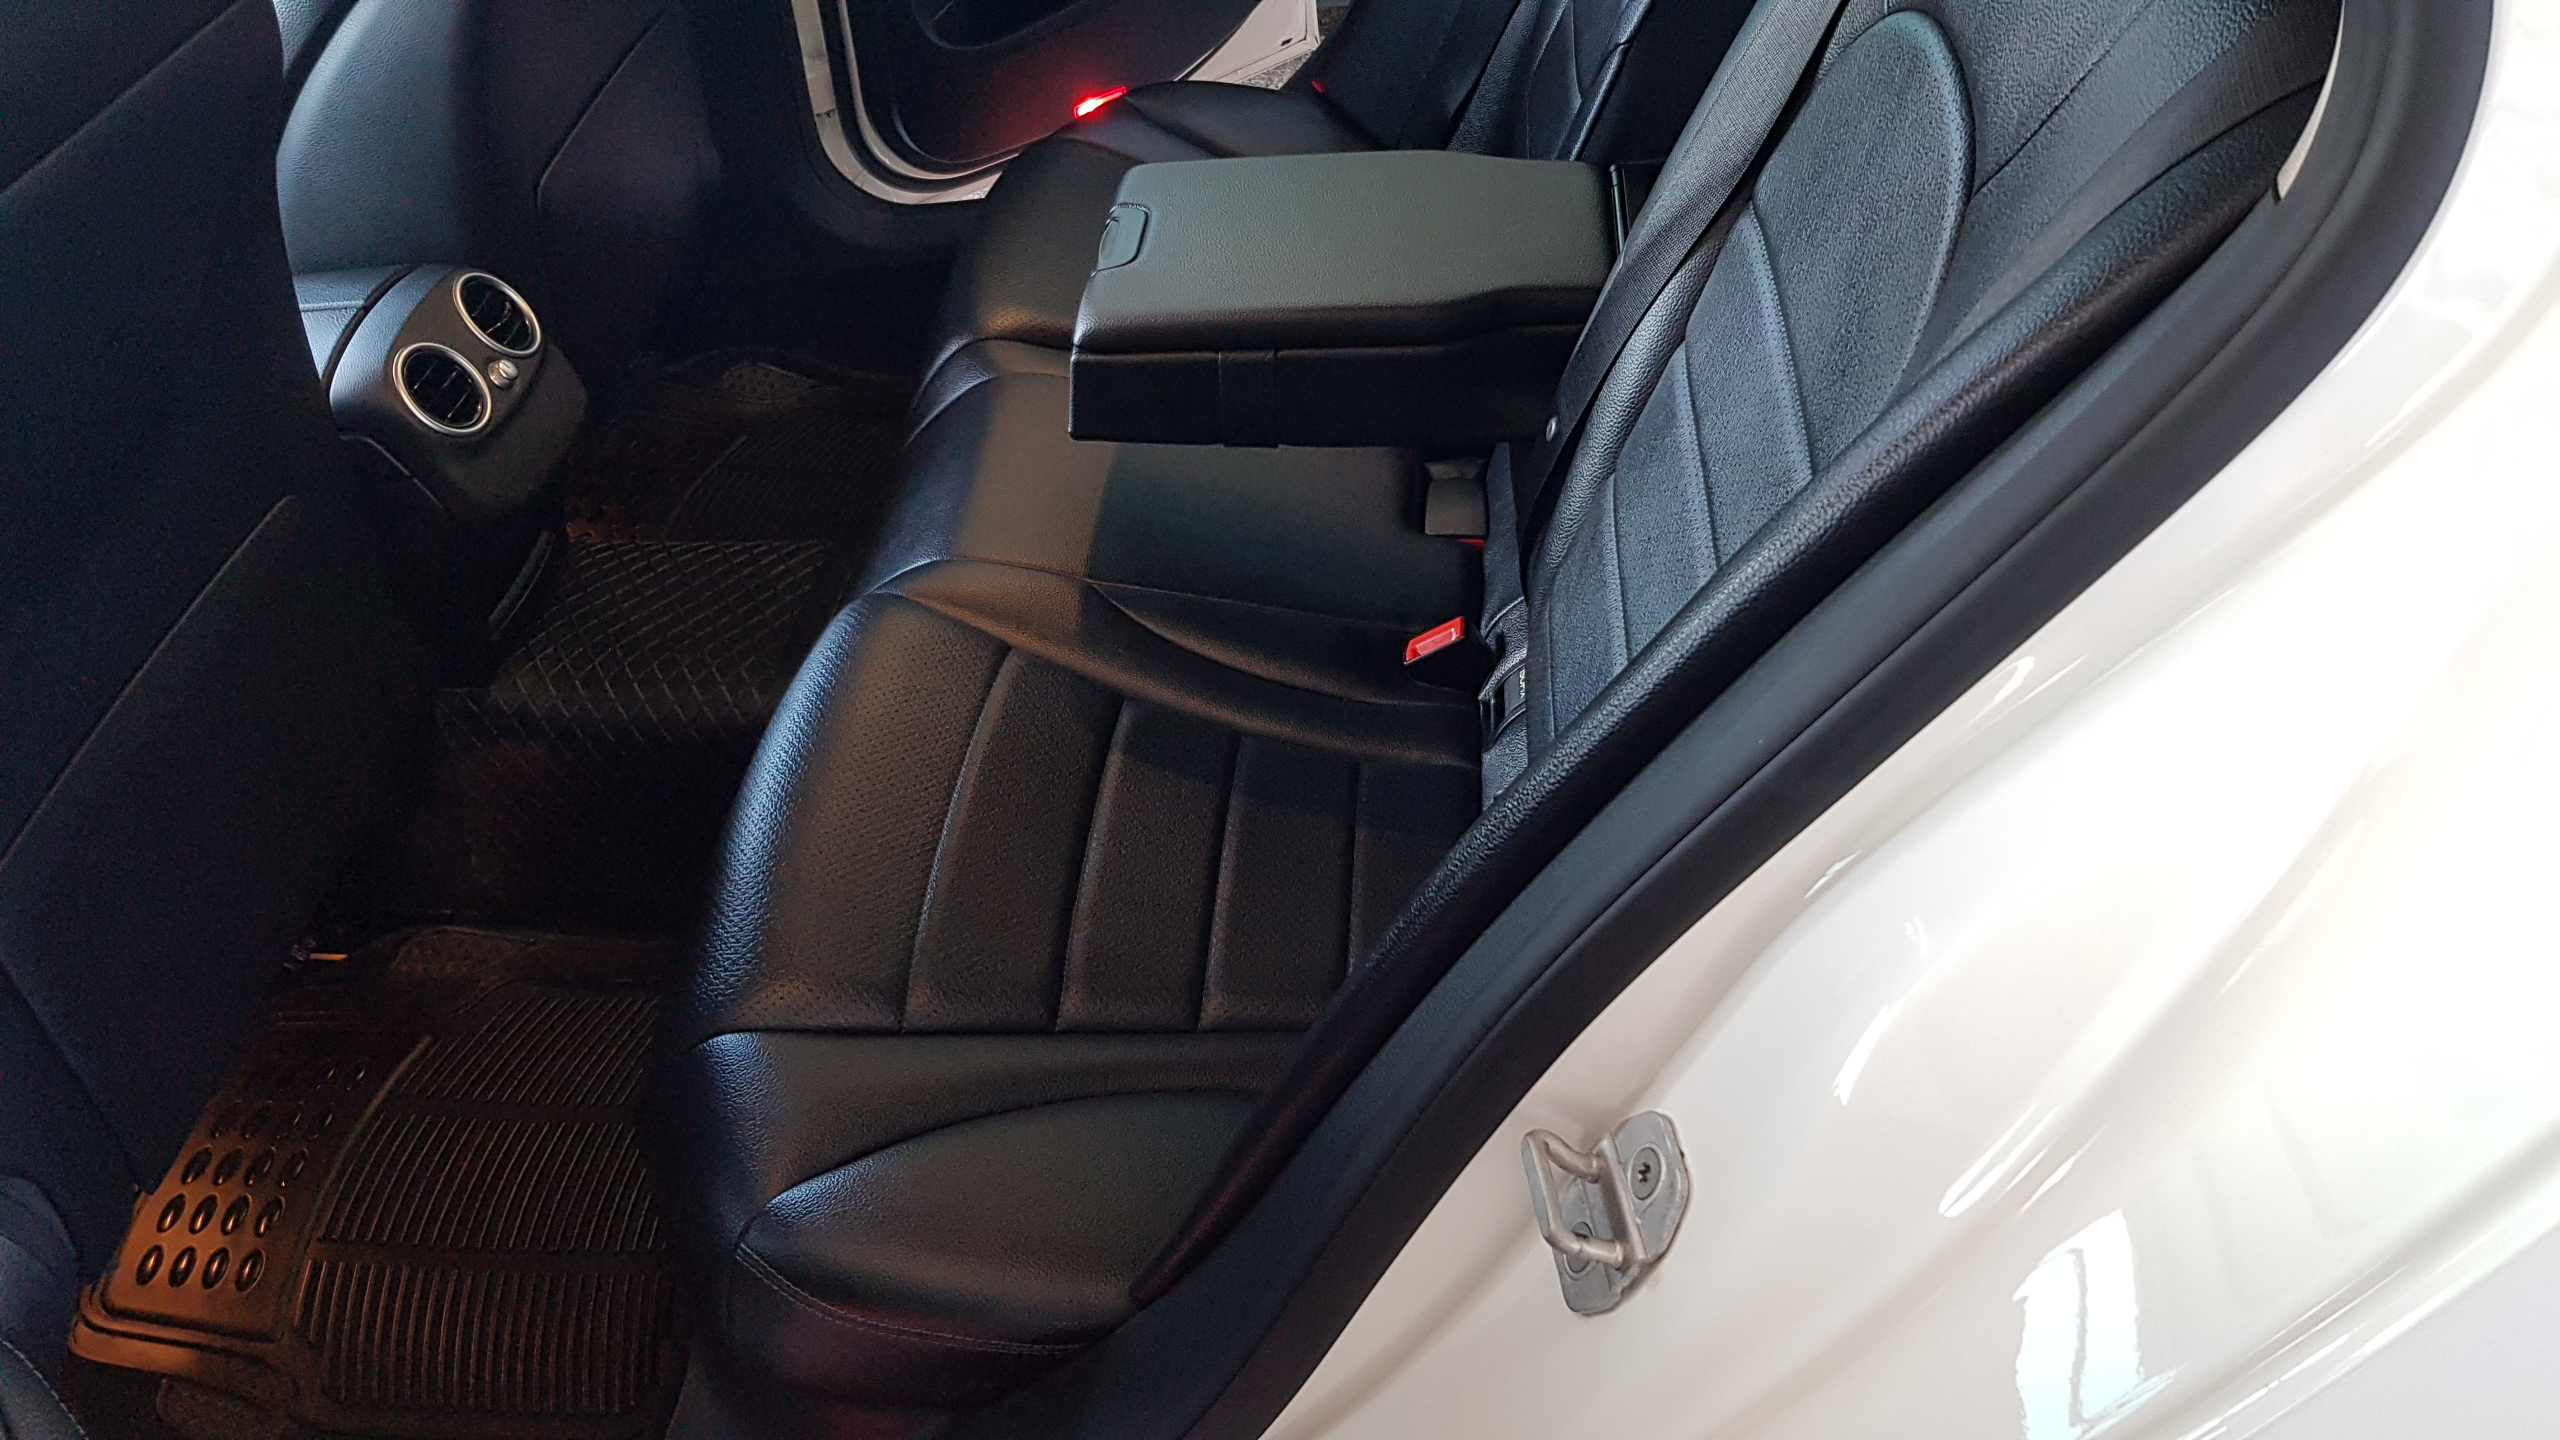 Mercedes C220 CDI White 09